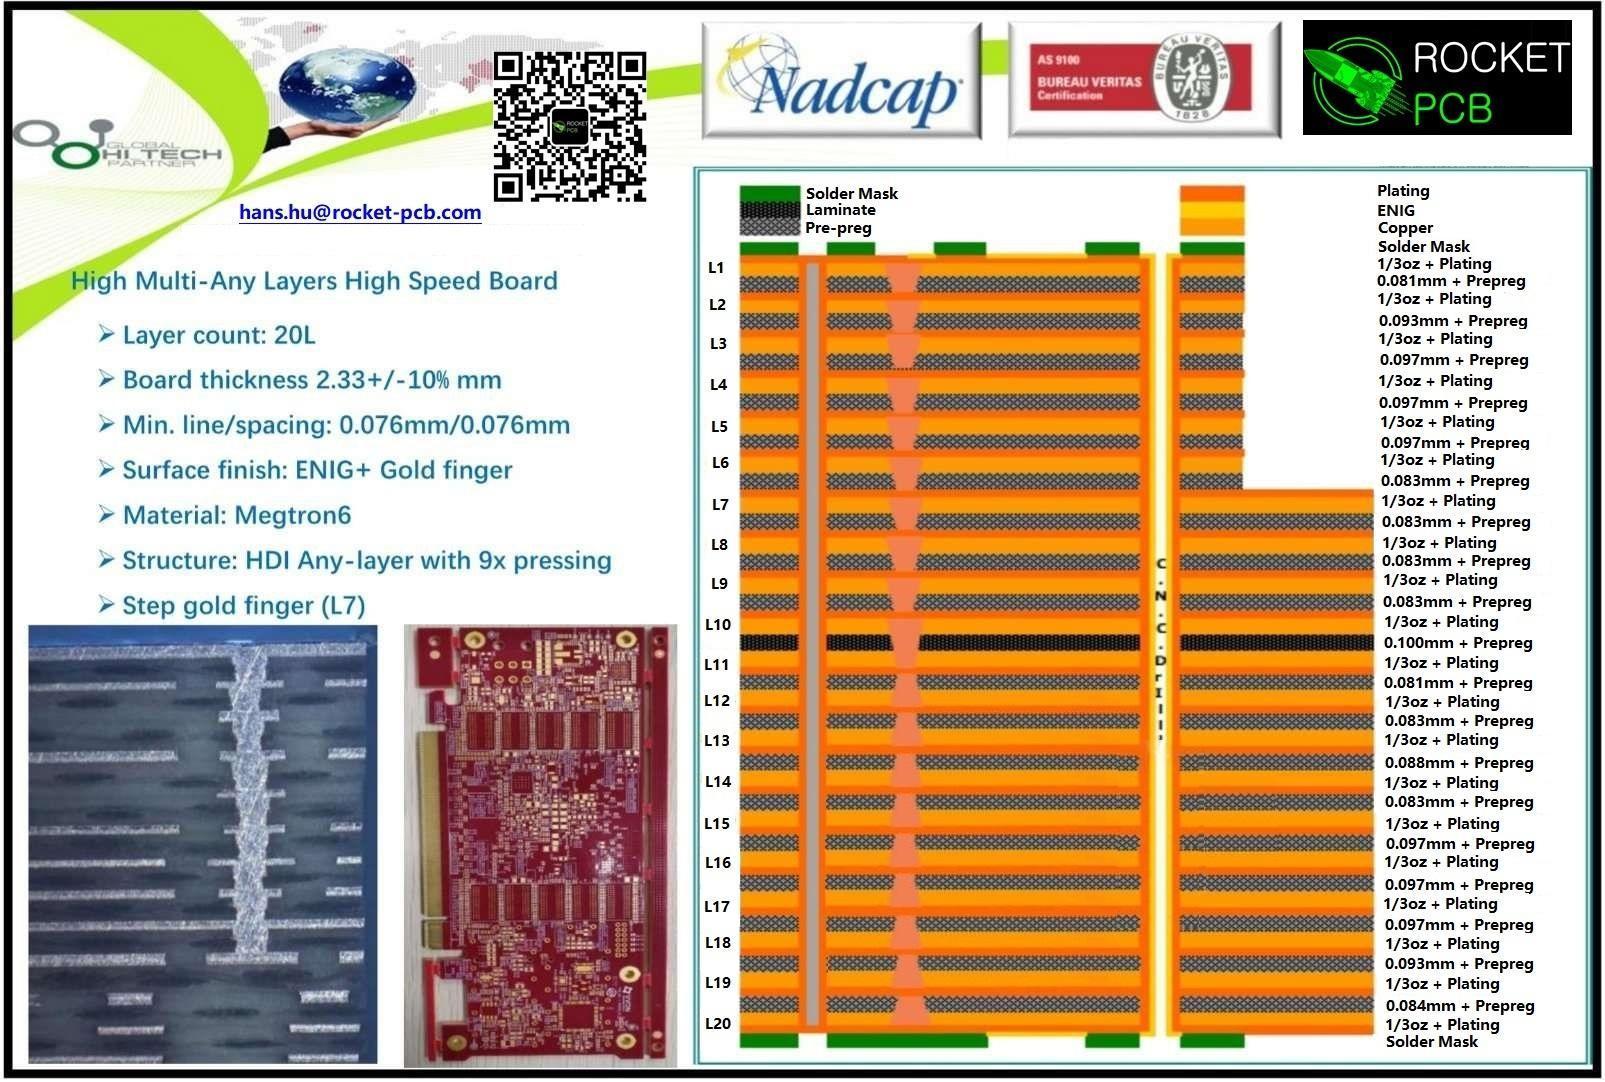 application-Rocket PCB-img